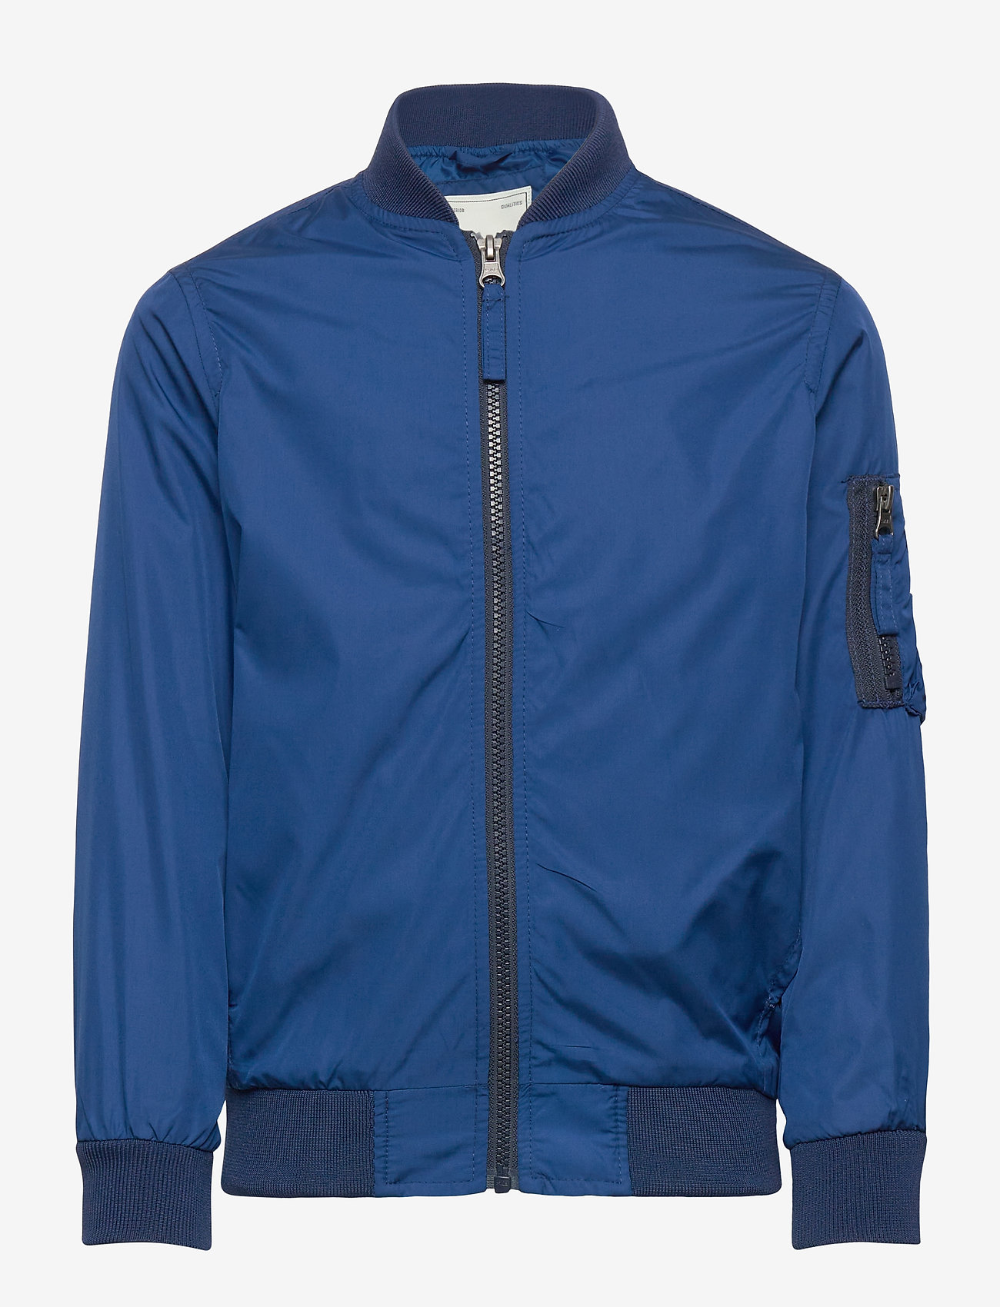 Pktakm Bush Bomber Jacket He Junior (Estate Blue) (299